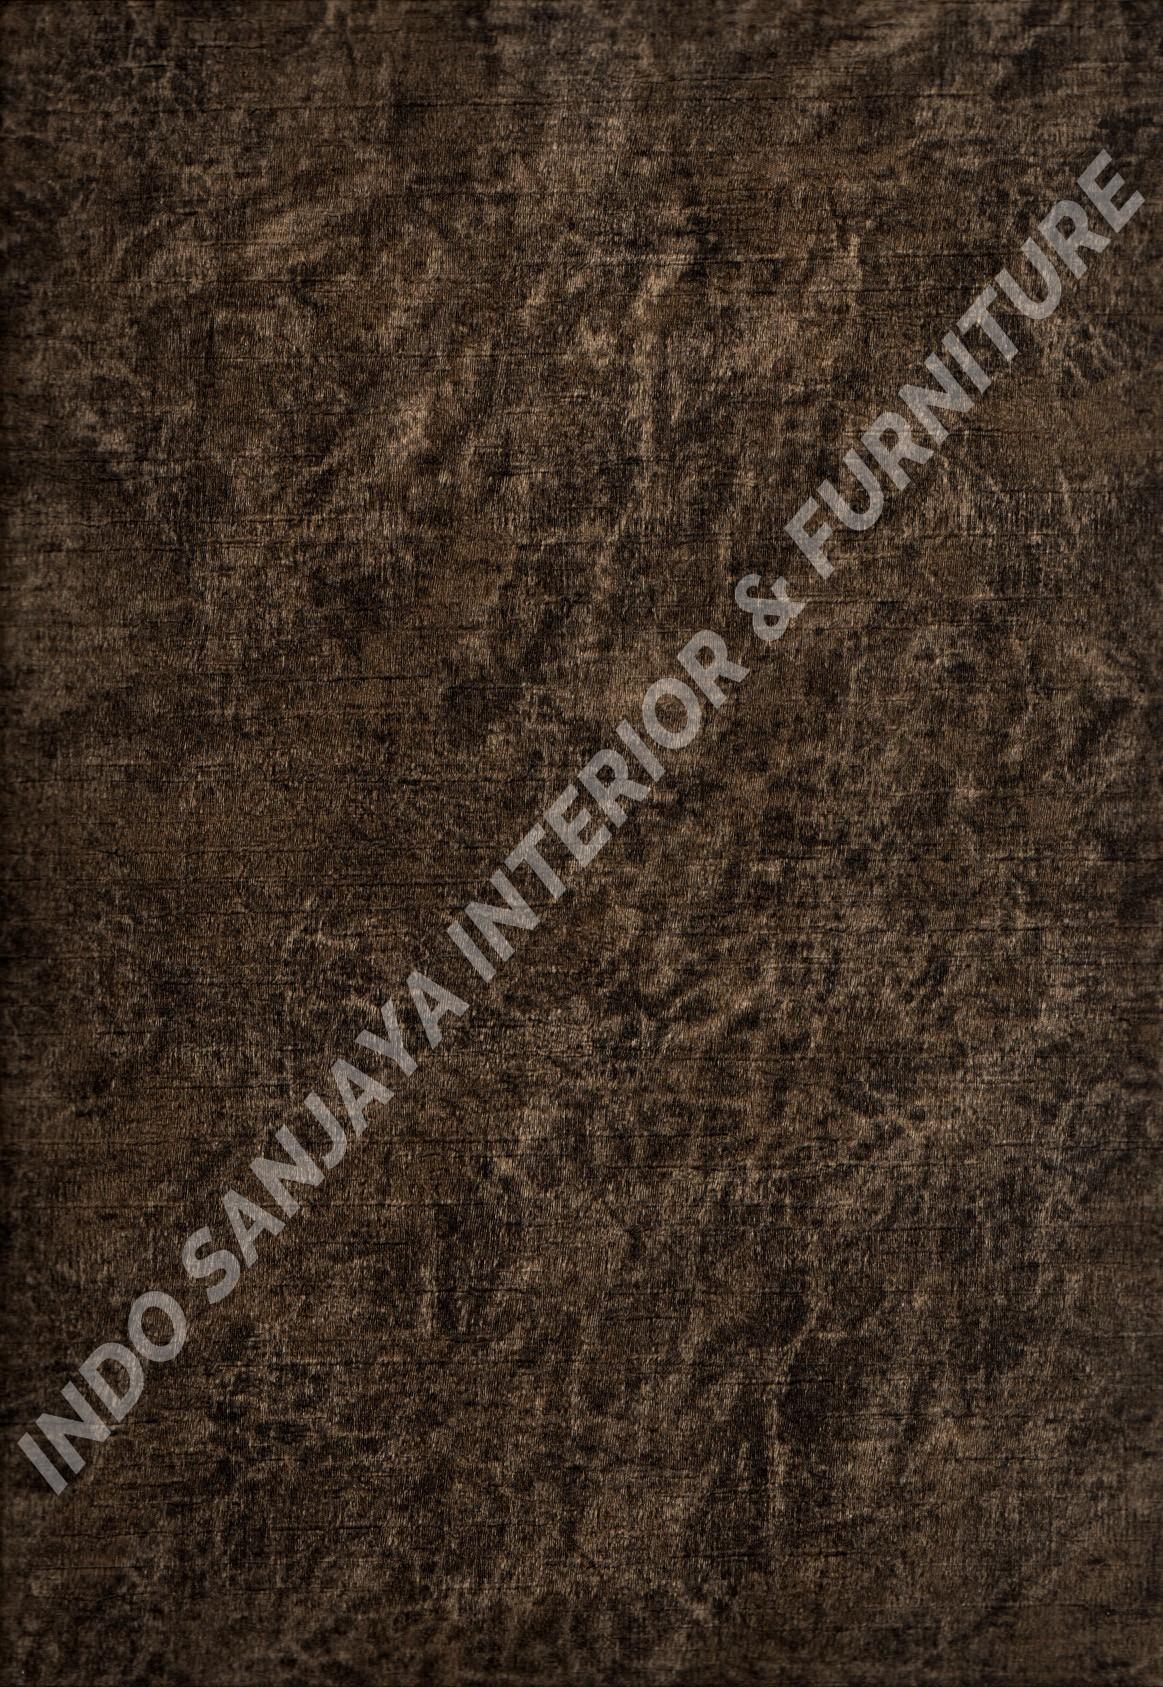 wallpaper   Wallpaper Minimalis Polos 8840:8840 corak  warna